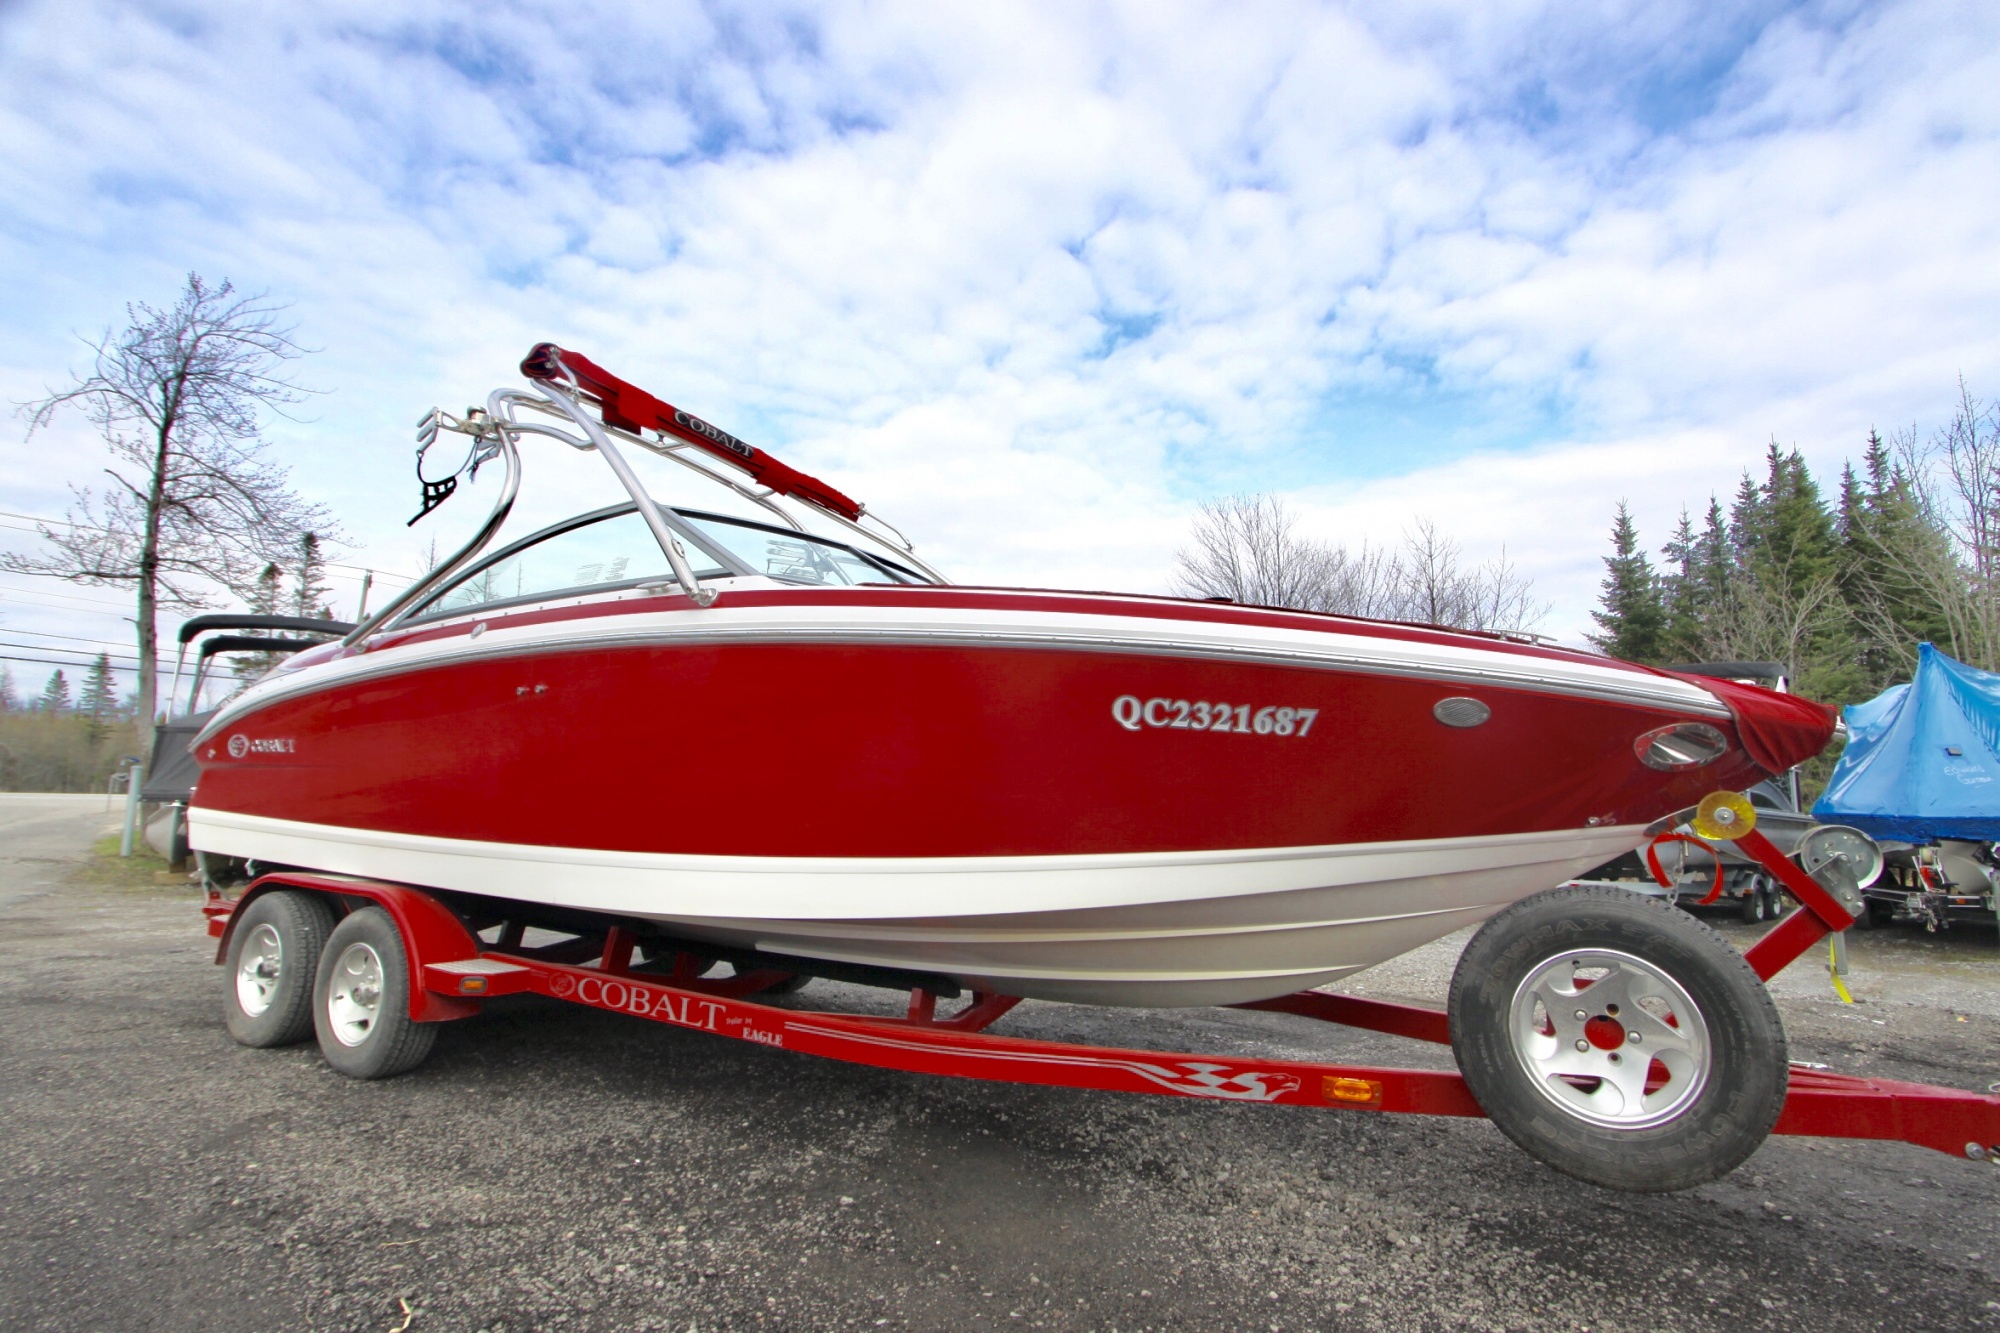 Cobalt Boats 222 - FF825226-D726-40E6-813A-0ED83BADDBB9.jpeg